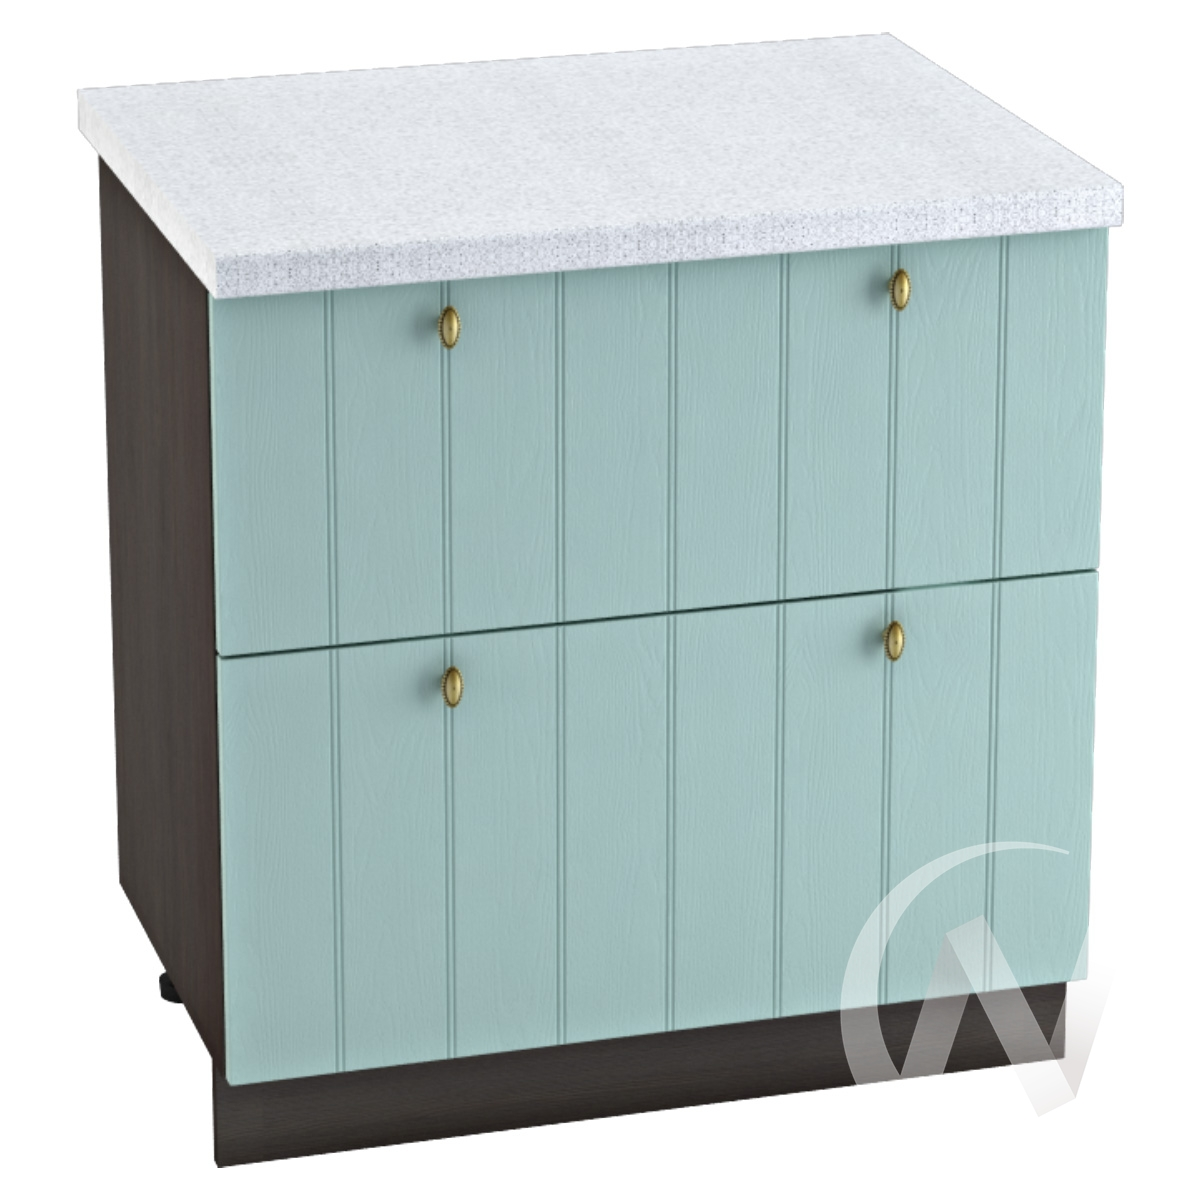 "Кухня ""Прованс"": Шкаф нижний с 2-мя ящиками 800, ШН2Я 800 (голубой/корпус венге)"